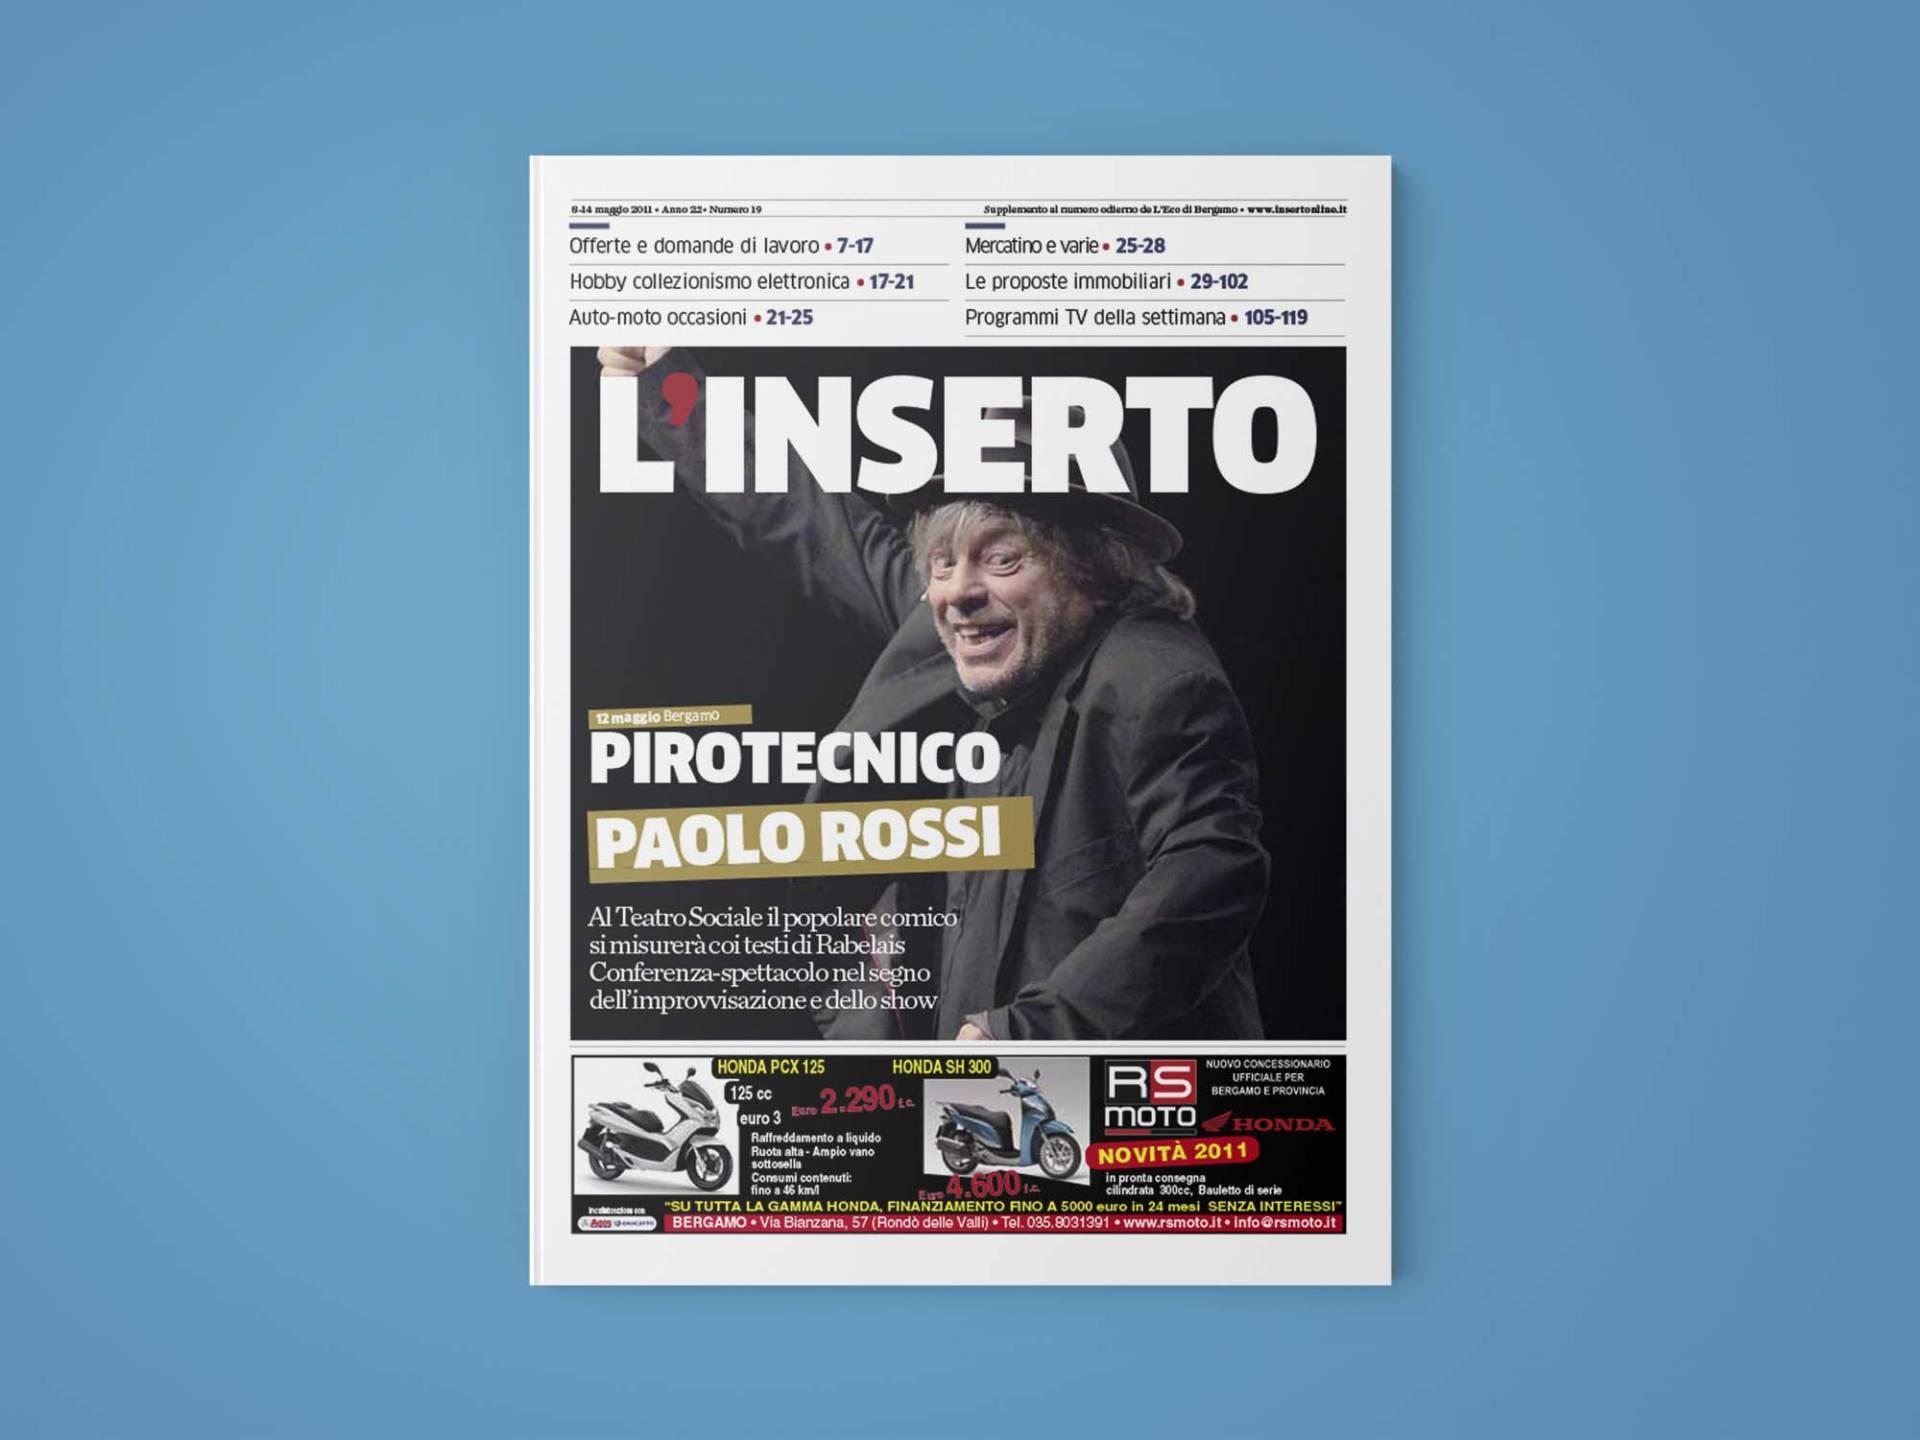 L'Inserto_01_Wenceslau_News_Design